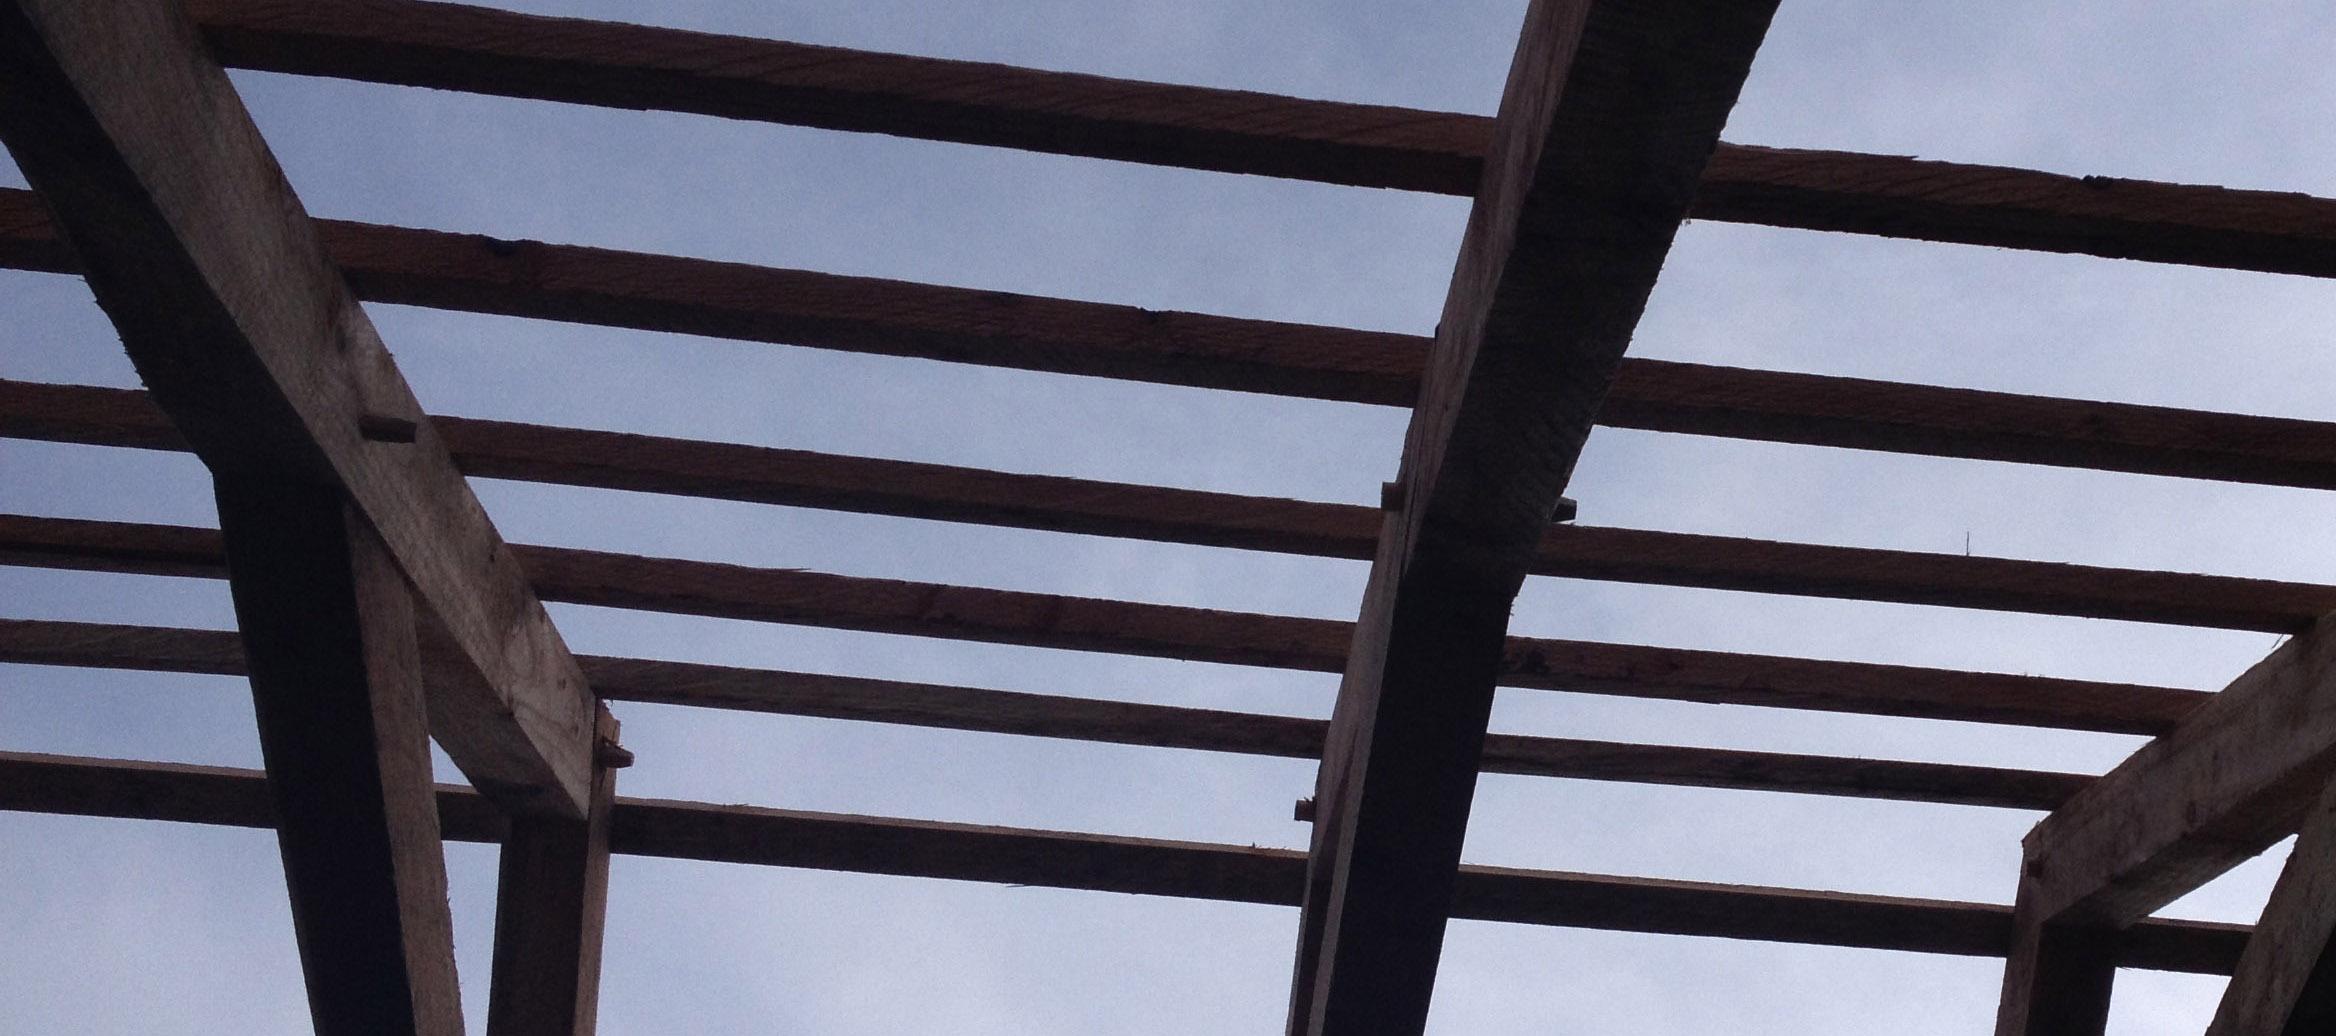 Shaker shed roof frame in douglas fir.